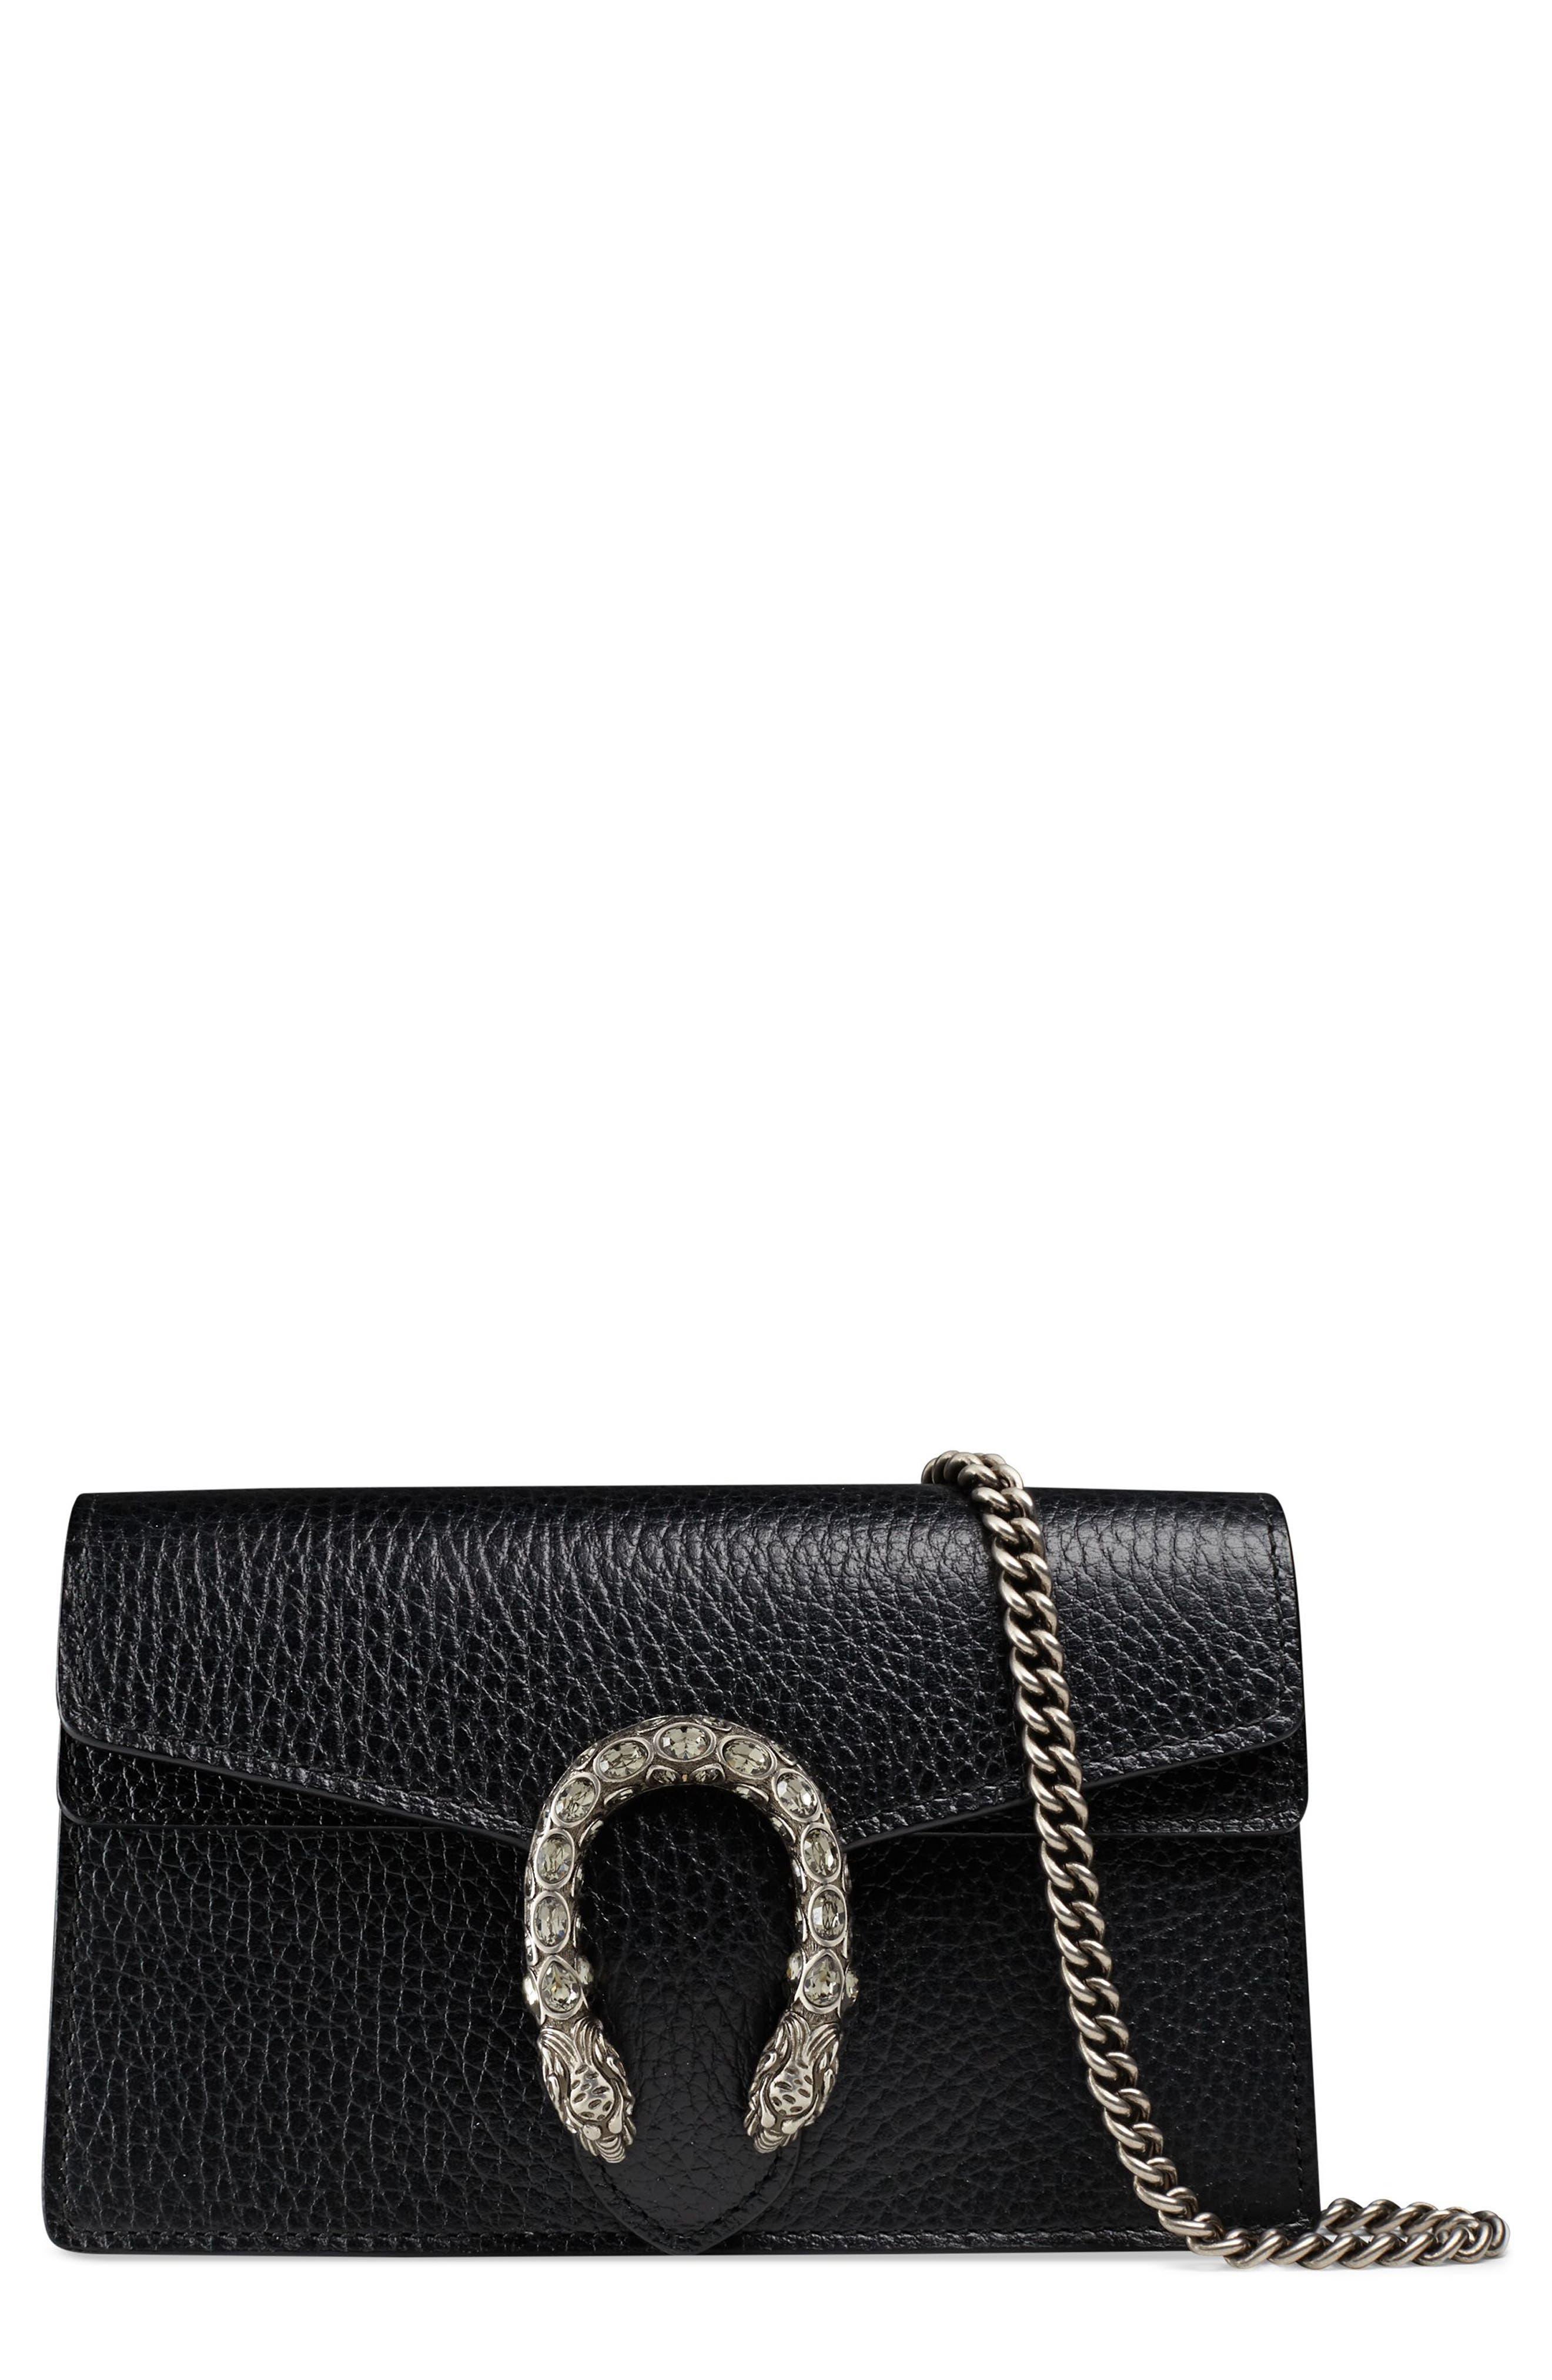 GUCCI,                             Super Mini Dionysus Leather Shoulder Bag,                             Main thumbnail 1, color,                             001